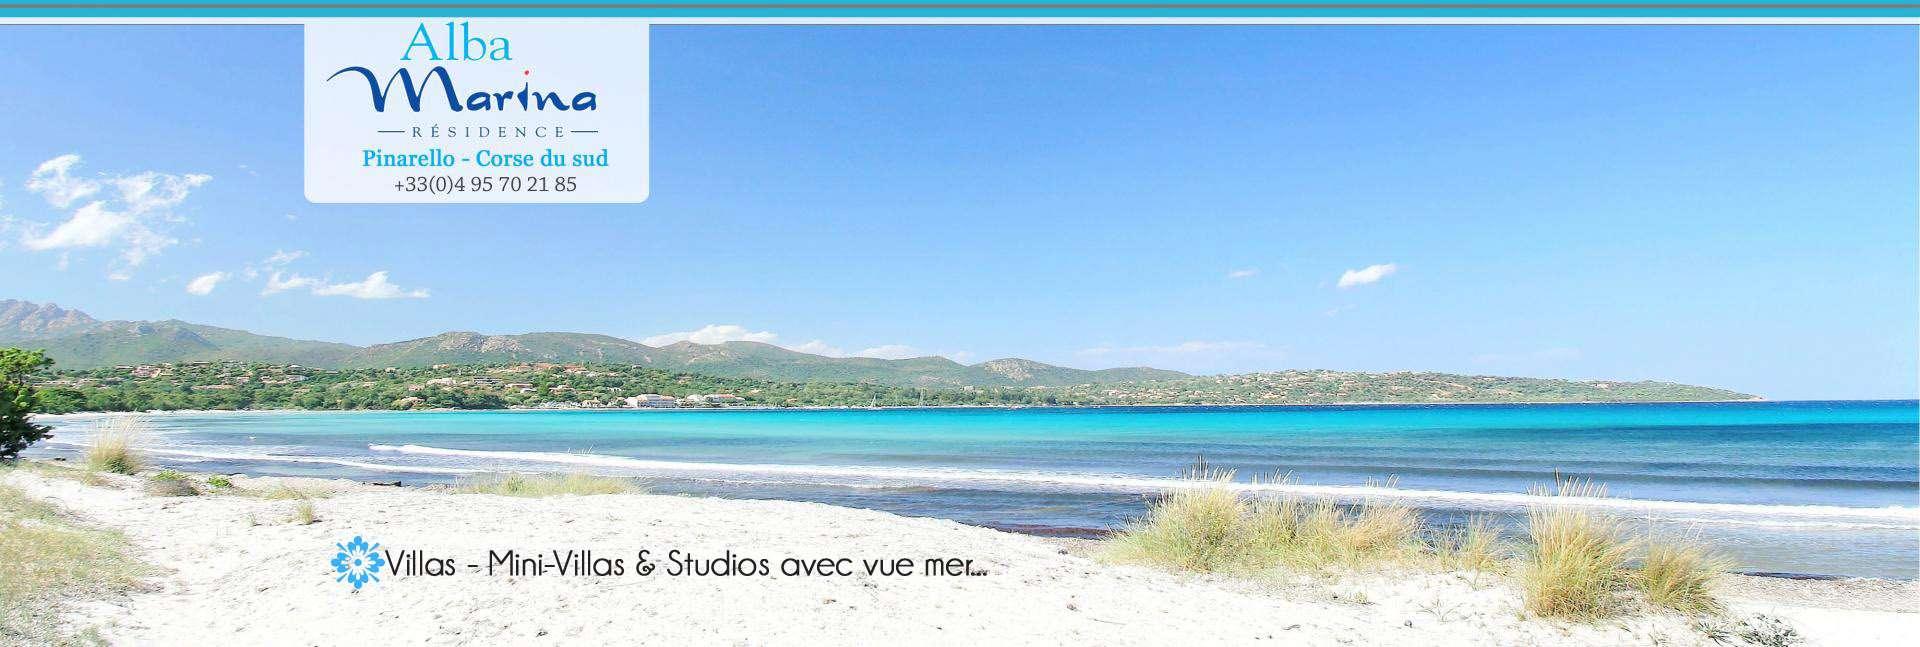 plage porto vecchio palombaggia santa giulia et pinarello plus belles plages porto vecchio. Black Bedroom Furniture Sets. Home Design Ideas